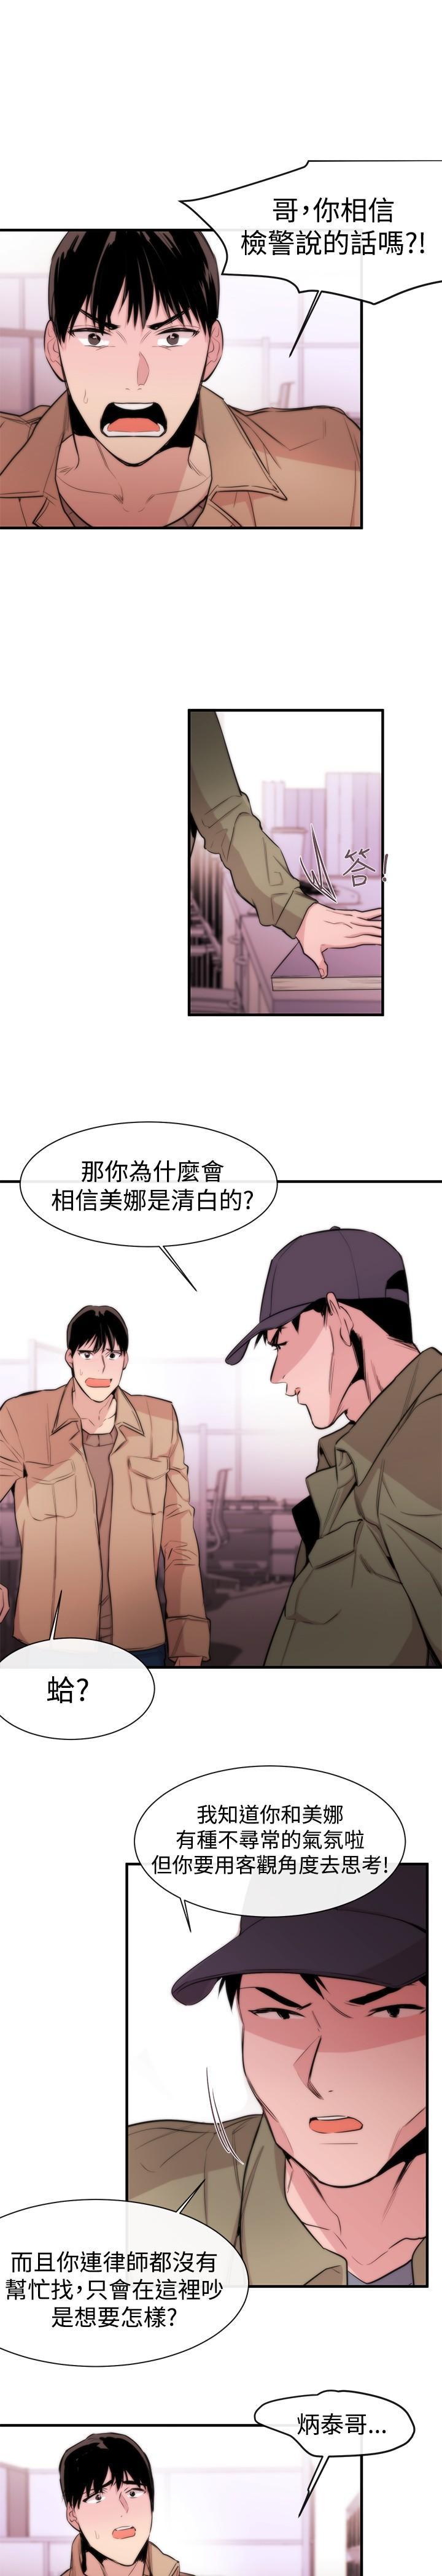 Female Disciple 女助教 Ch.1~8 [Chinese]中文 236